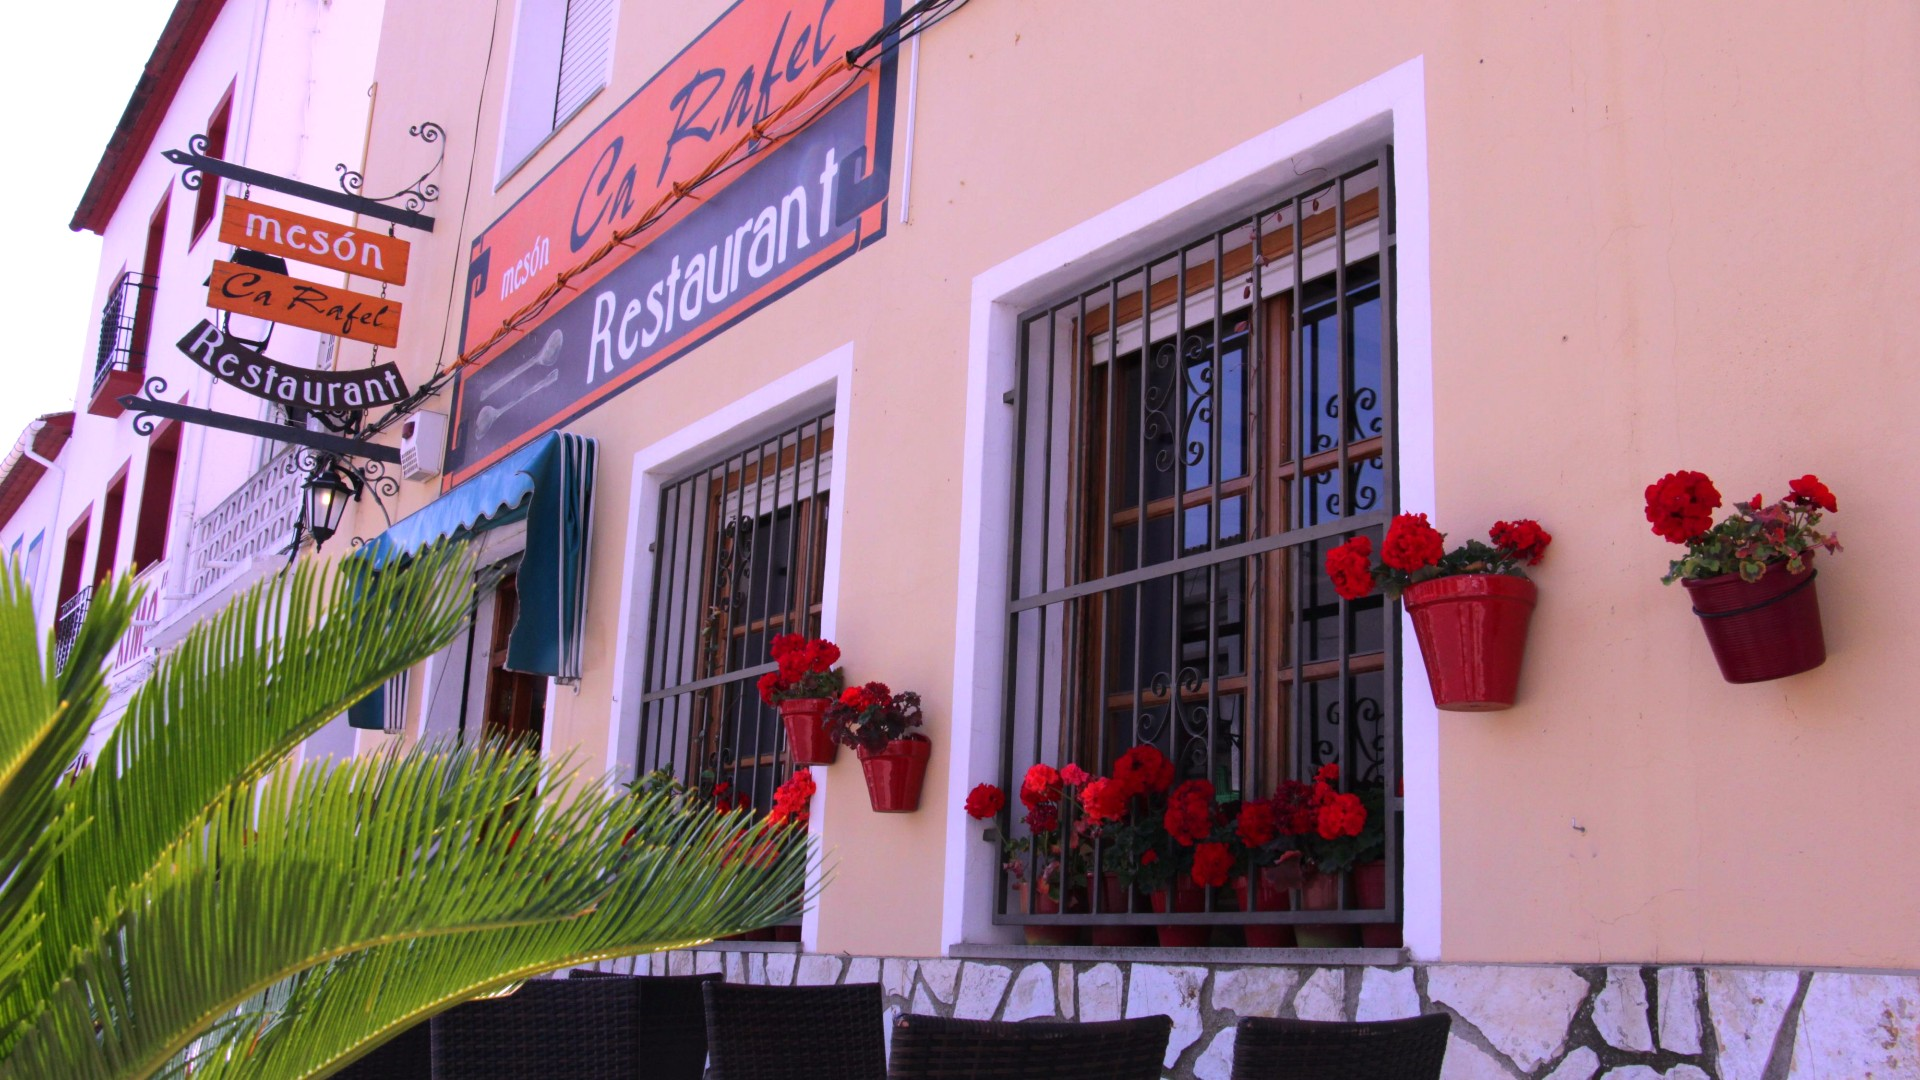 Restaurante Benimantell Mesón Ca Rafel